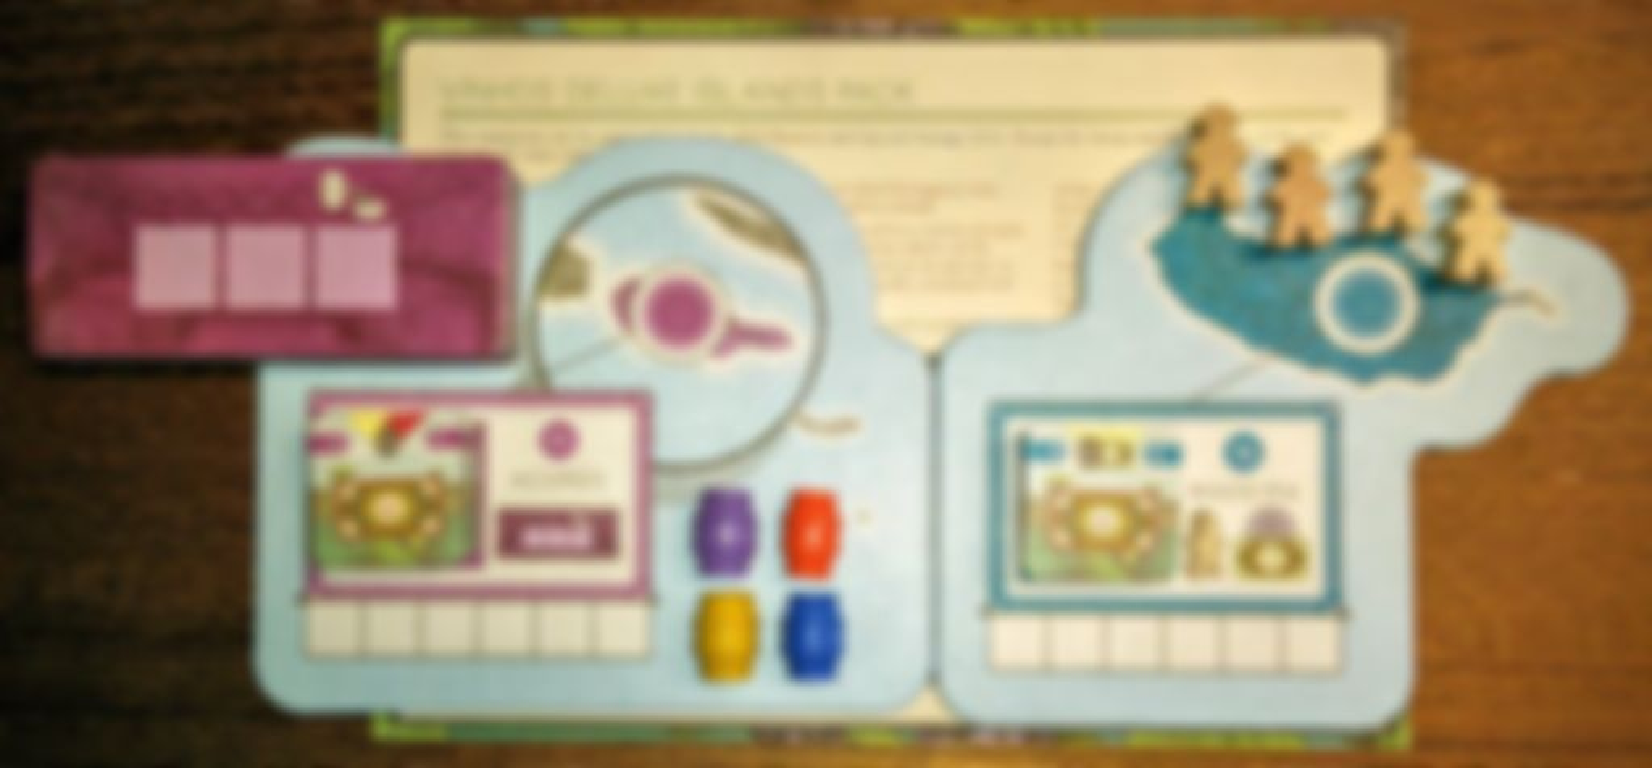 Vinhos Deluxe Edition: Islands Expansion Pack components